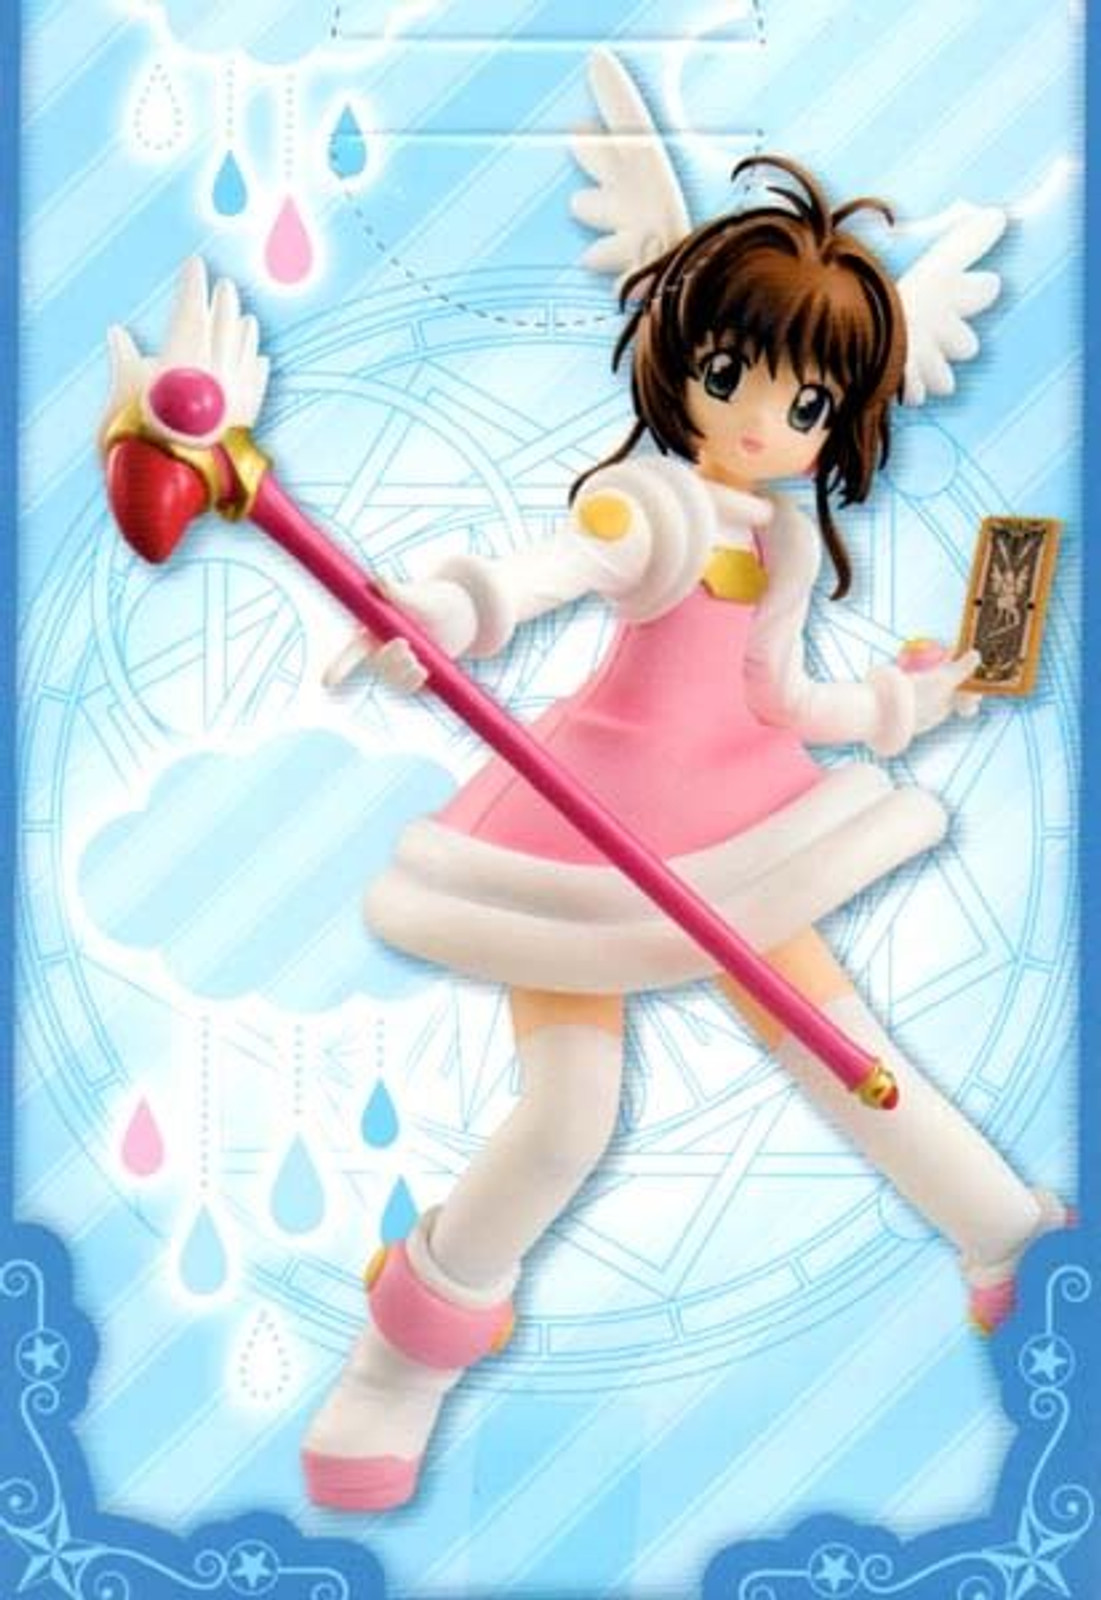 Cardcaptor Sakura Special Figure Series Cheerful Pink CLAMP Furyu JAPAN ANIME